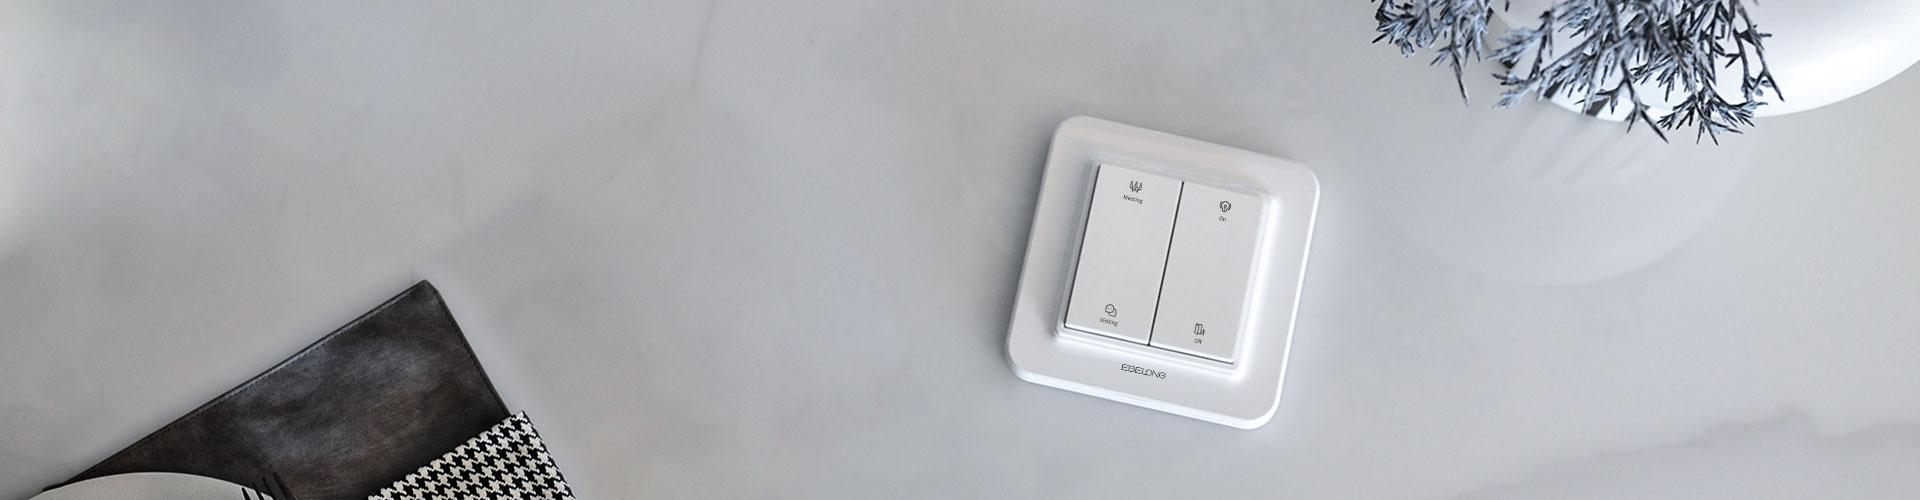 E2 Self-powered switch EBELONG